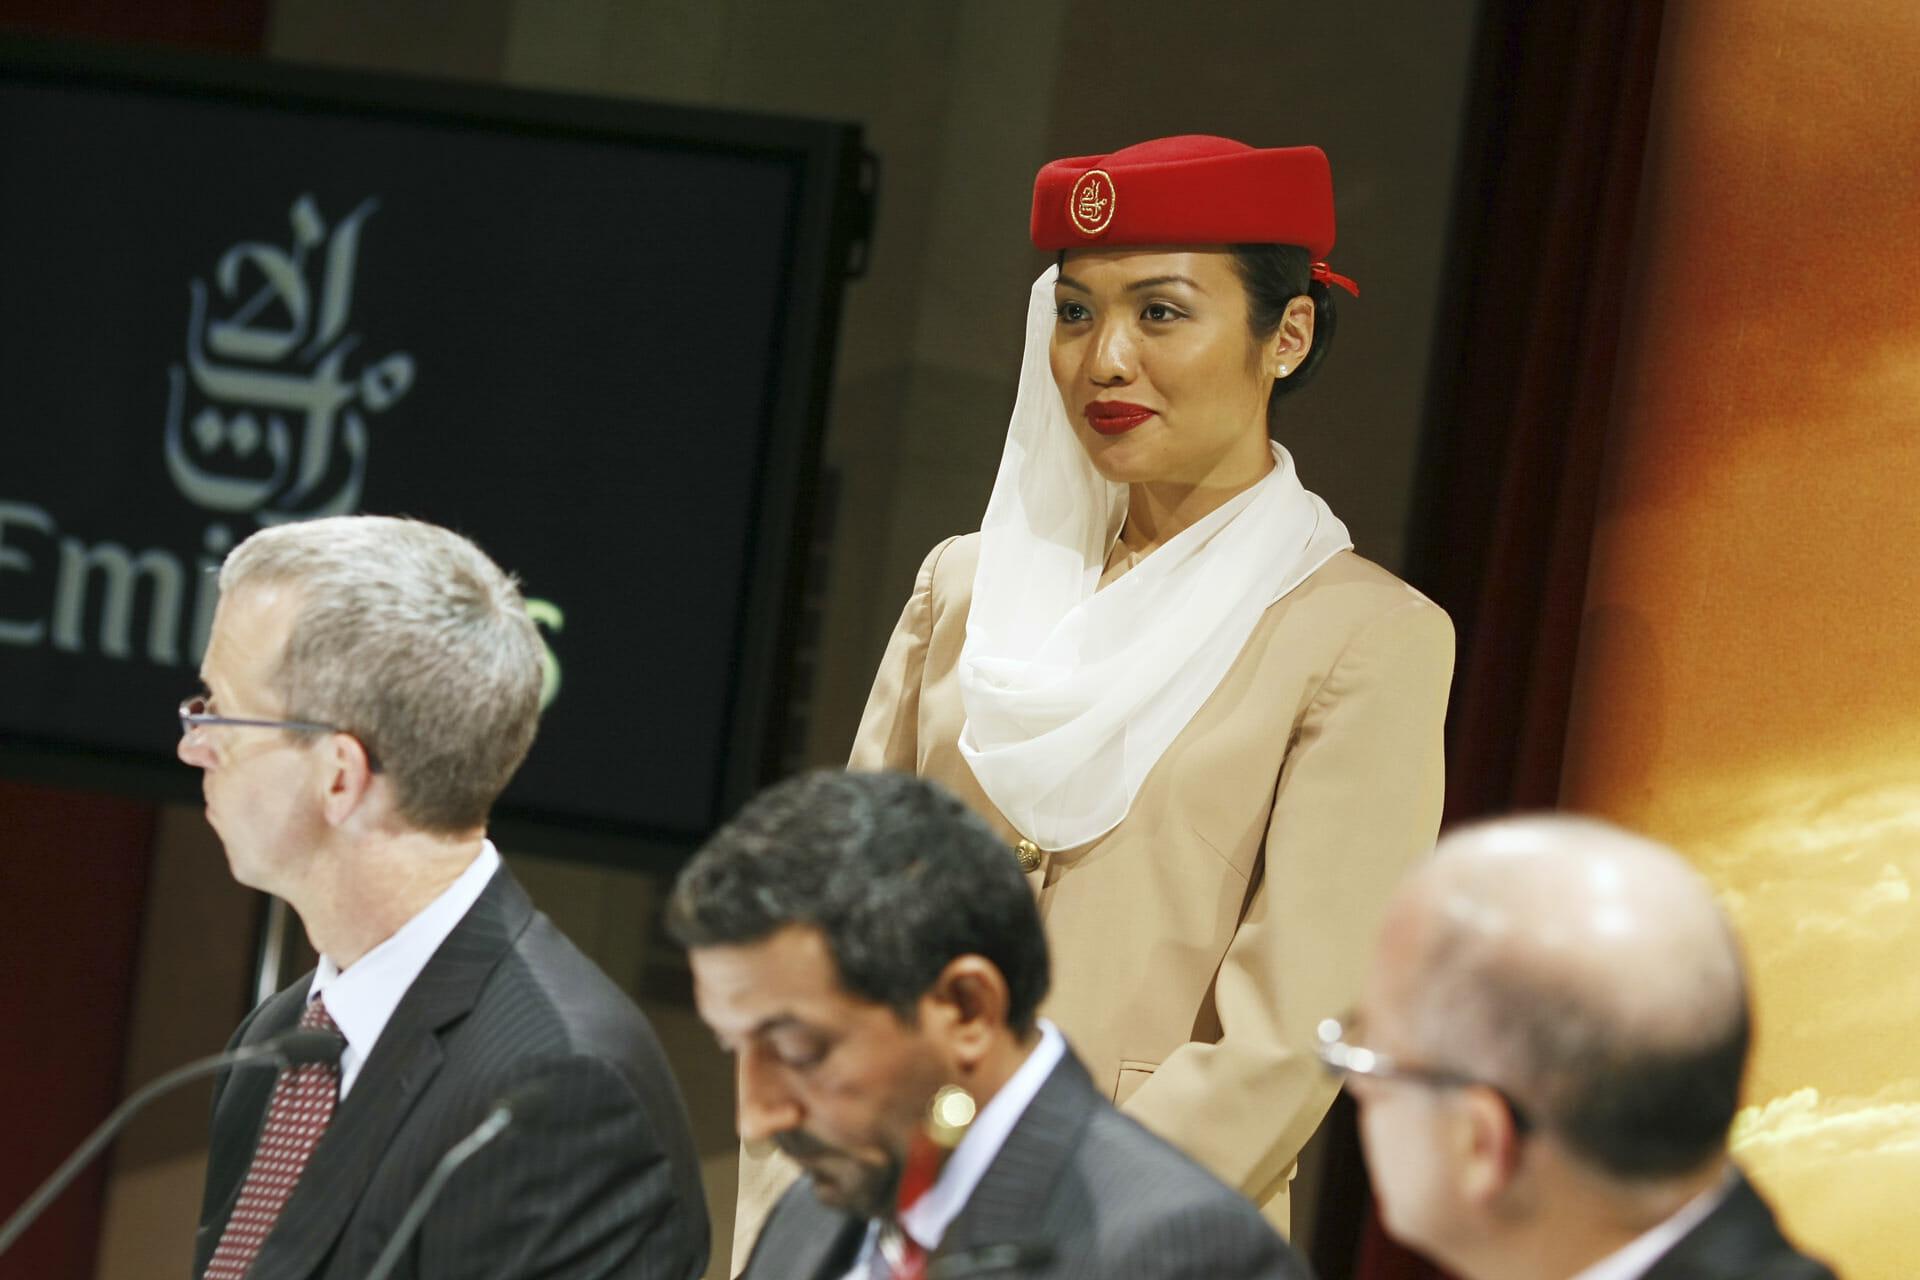 Emirates Air Inaugural Flight @ SFO